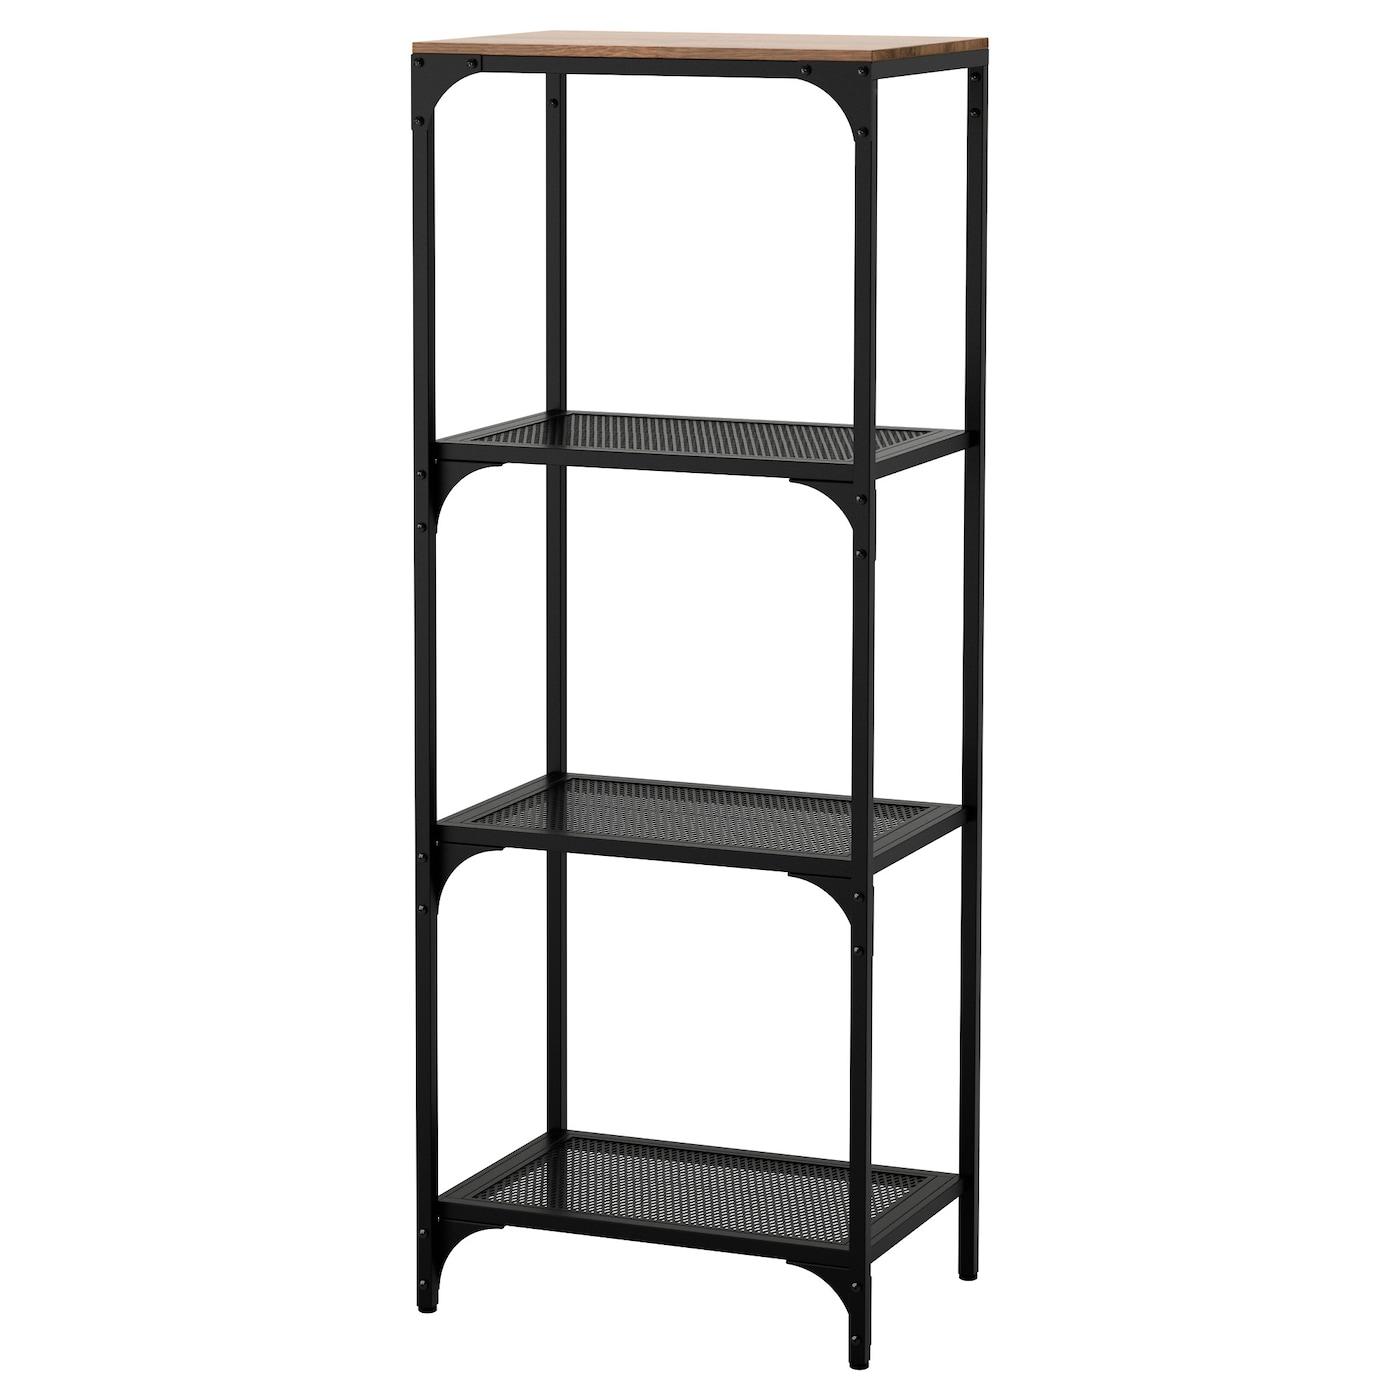 fj llbo tag re noir 50 x 136 cm ikea. Black Bedroom Furniture Sets. Home Design Ideas